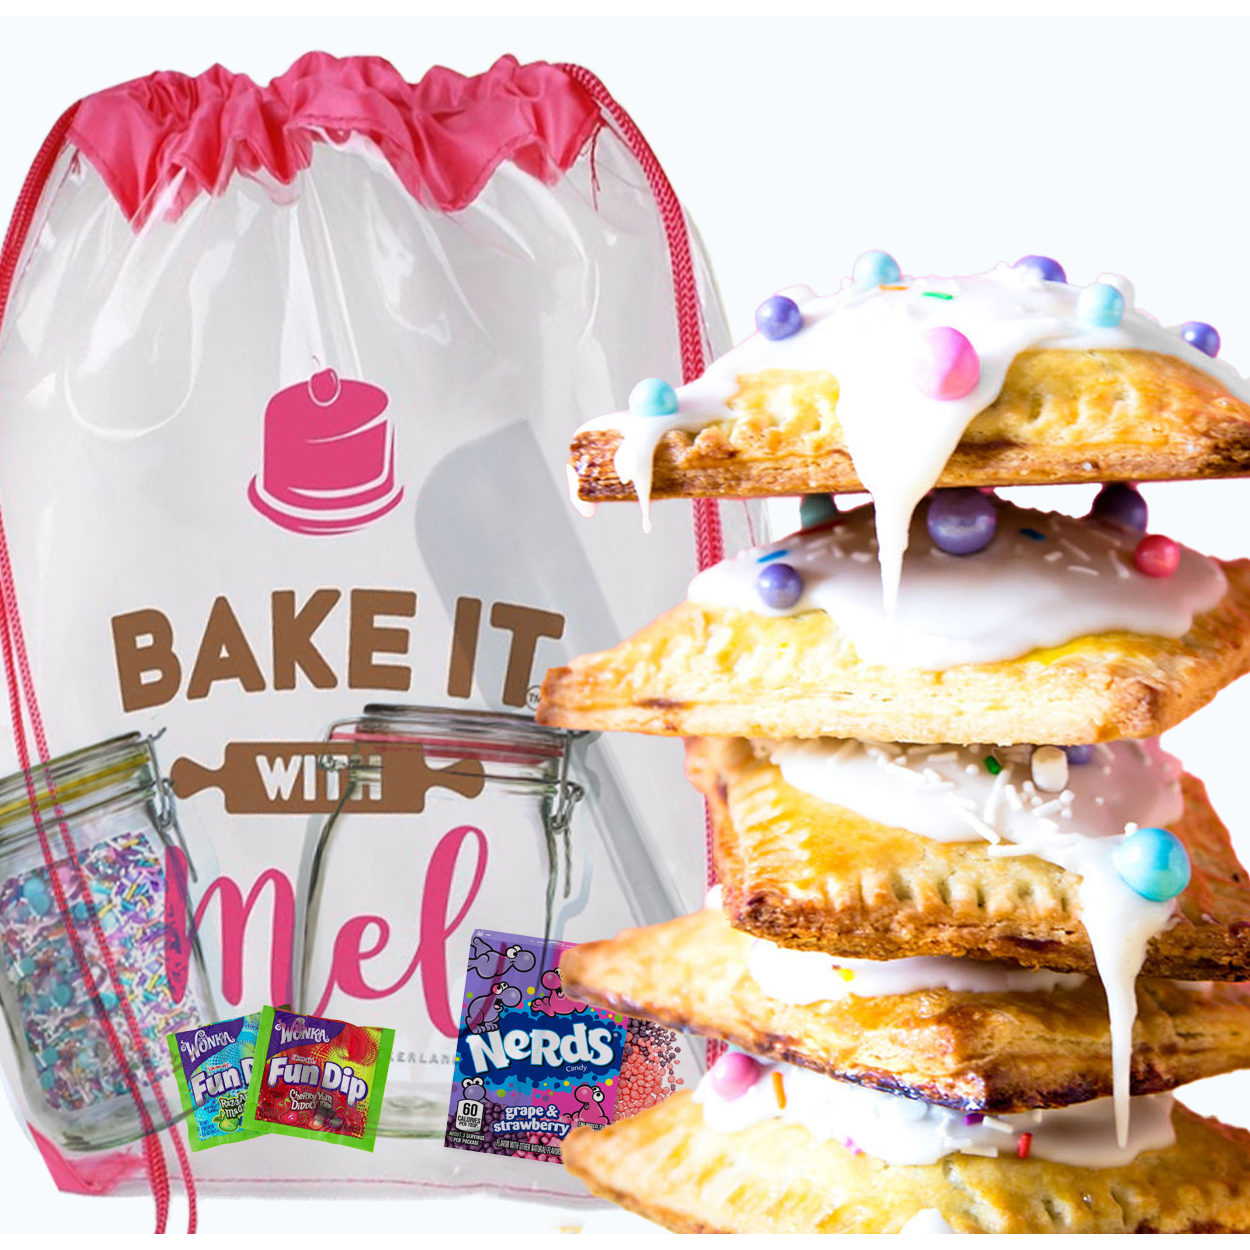 Bake it with Mel Virtual Baking Class